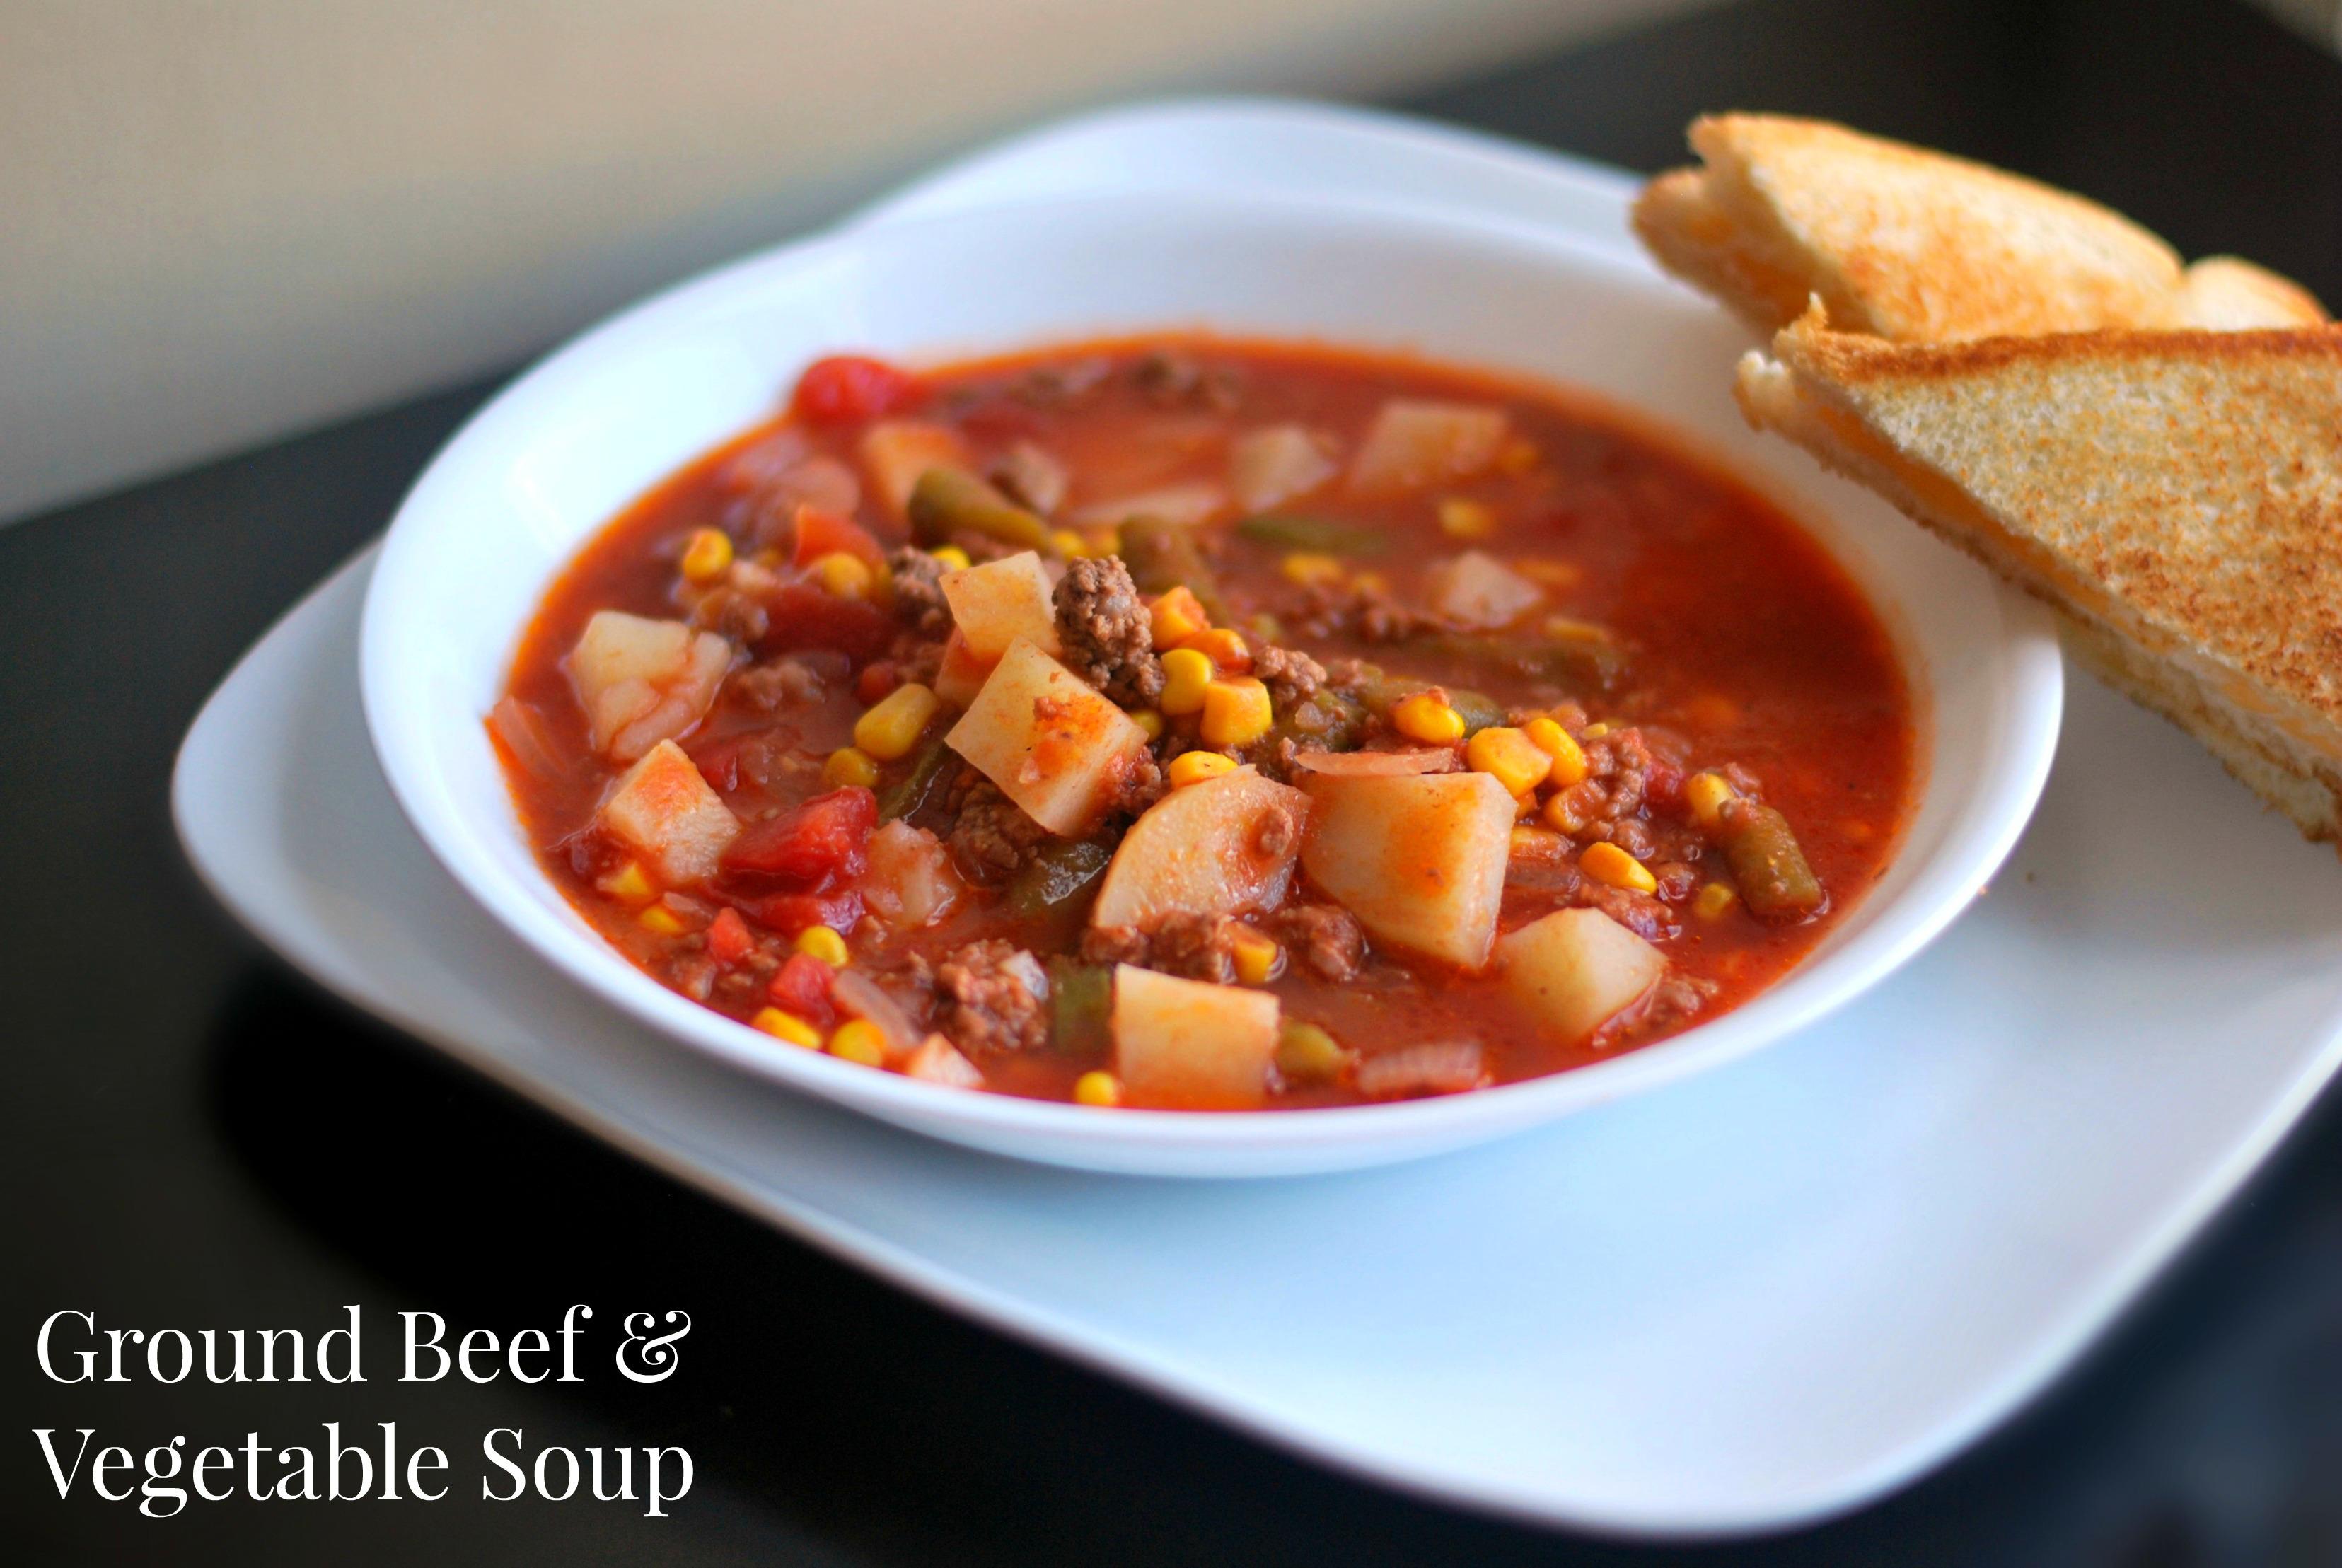 Nana's Ground Beef & Vegetable Soup